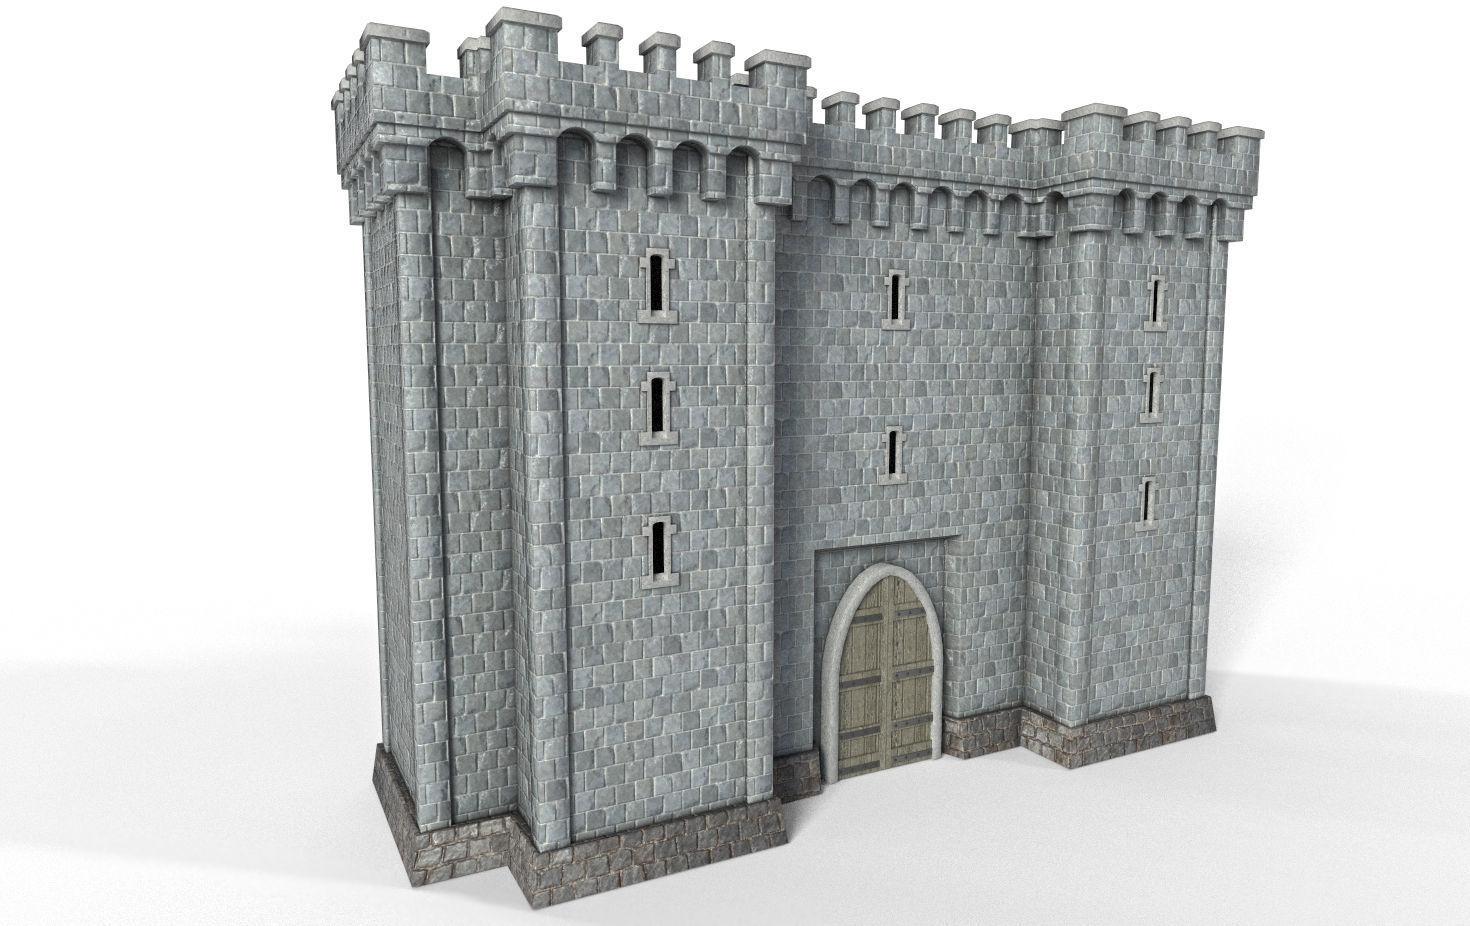 Stone tower v6